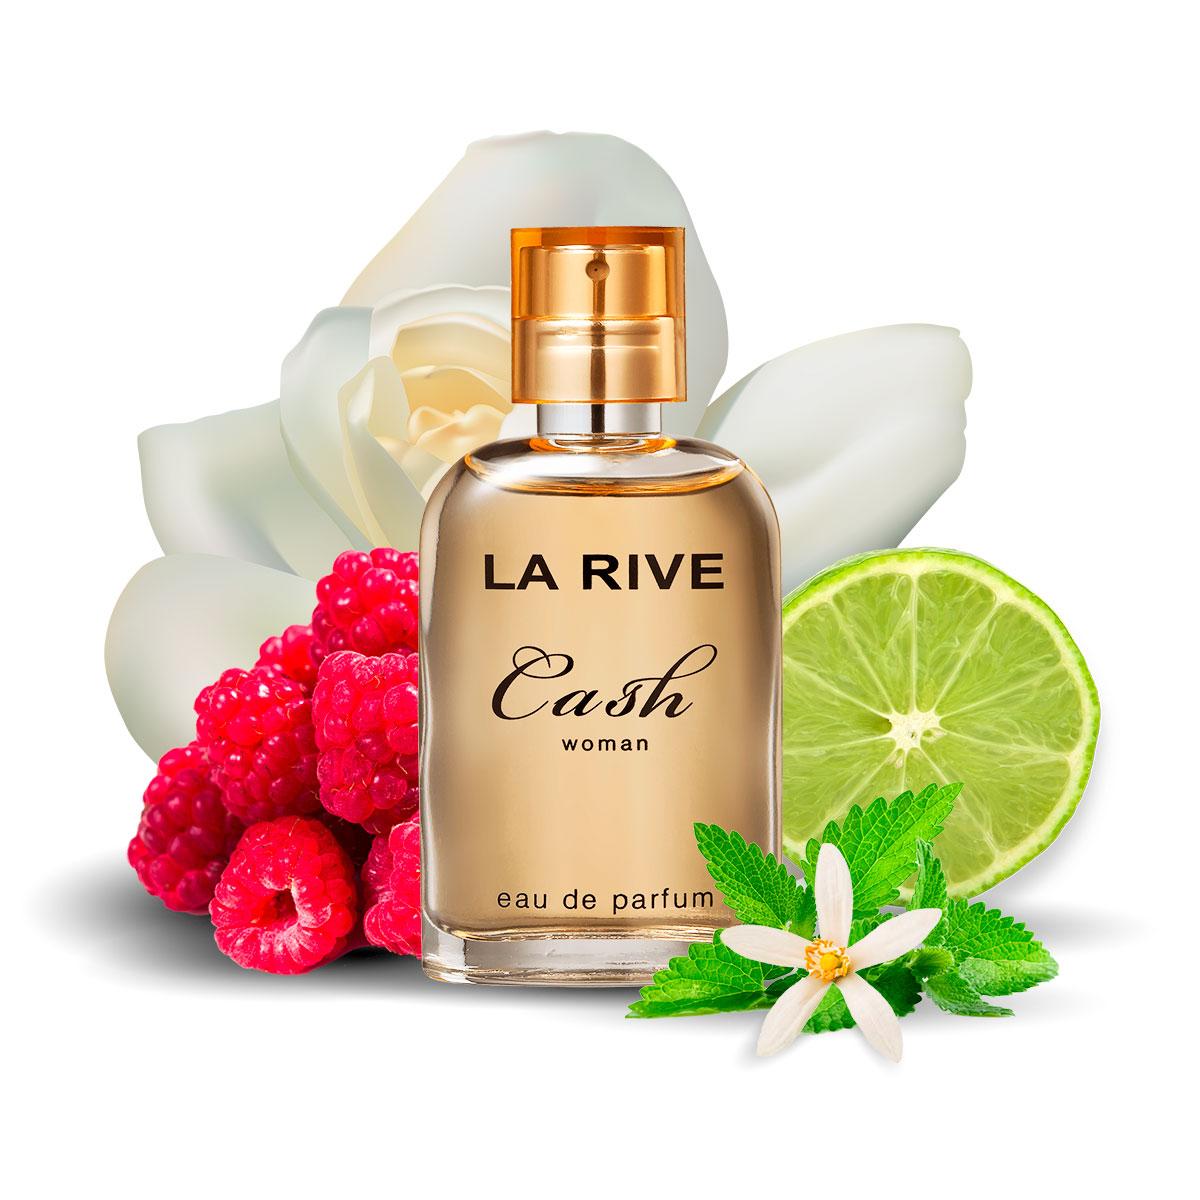 Kit  perfume Cash Woman 90ml + 30ml de Bolsa La Rive